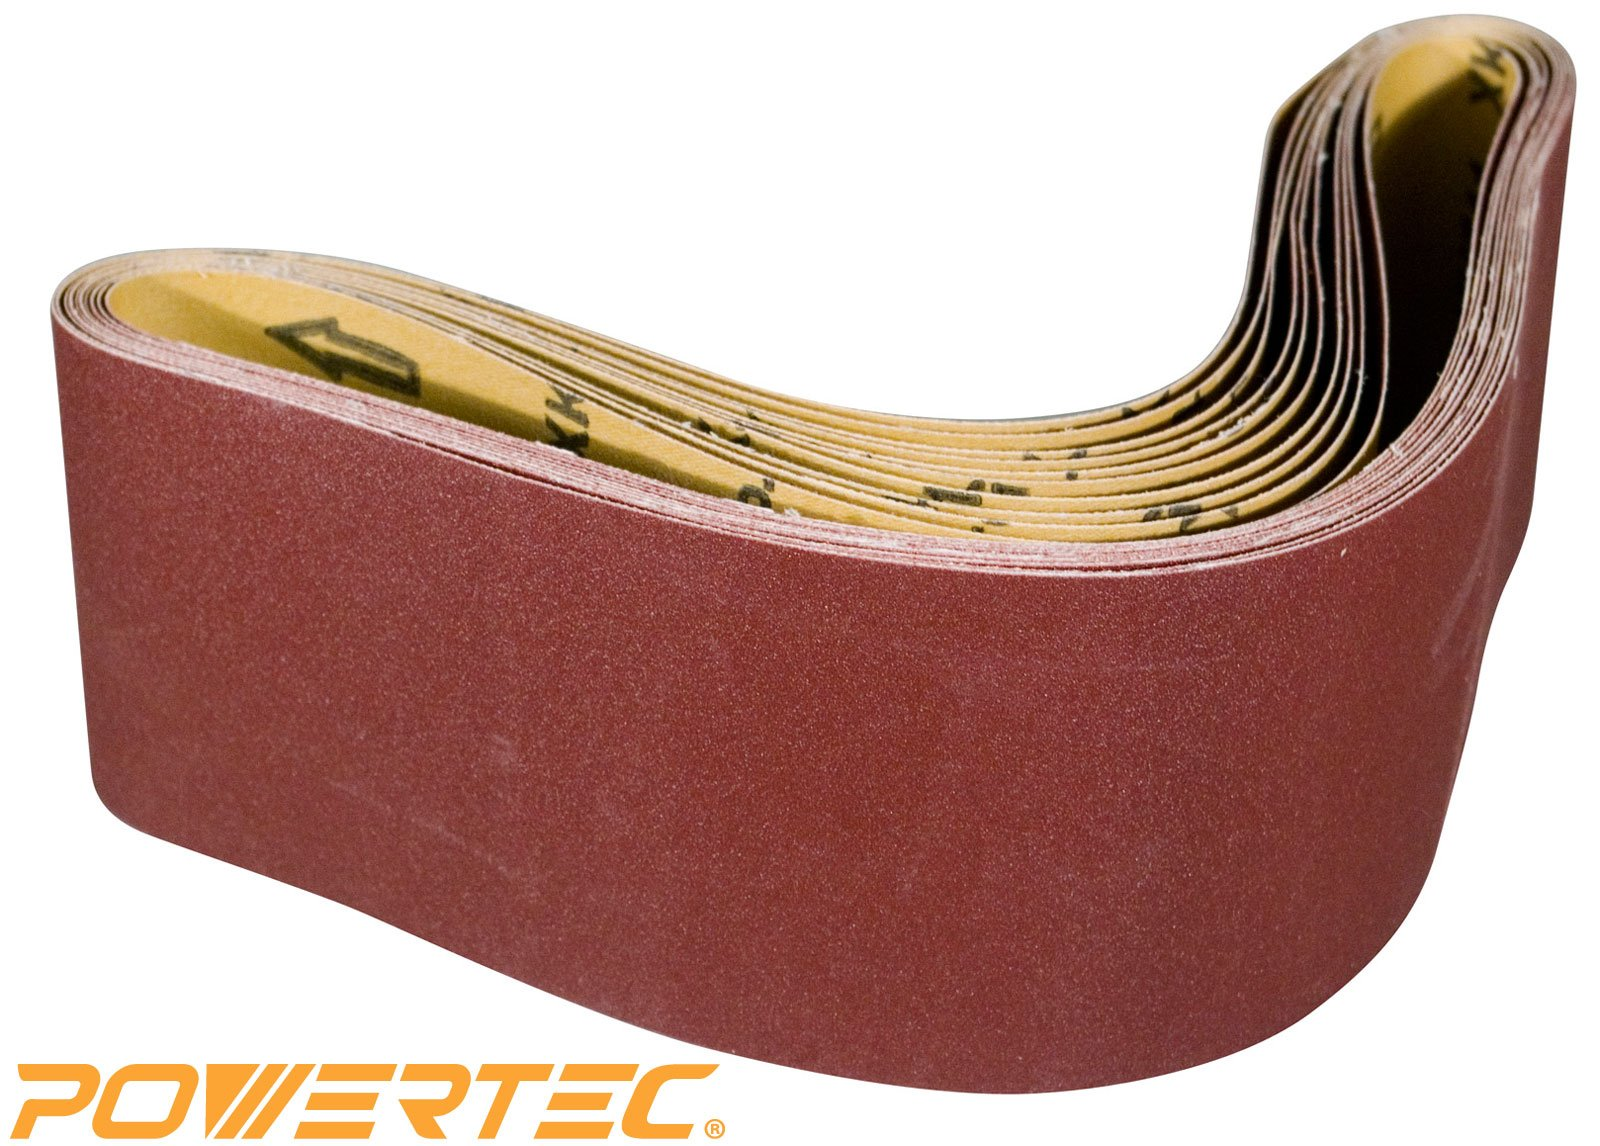 POWERTEC 110680 4-Inch x 36-Inch 80 Grit Aluminum Oxide Sanding Belt, 10-Pack